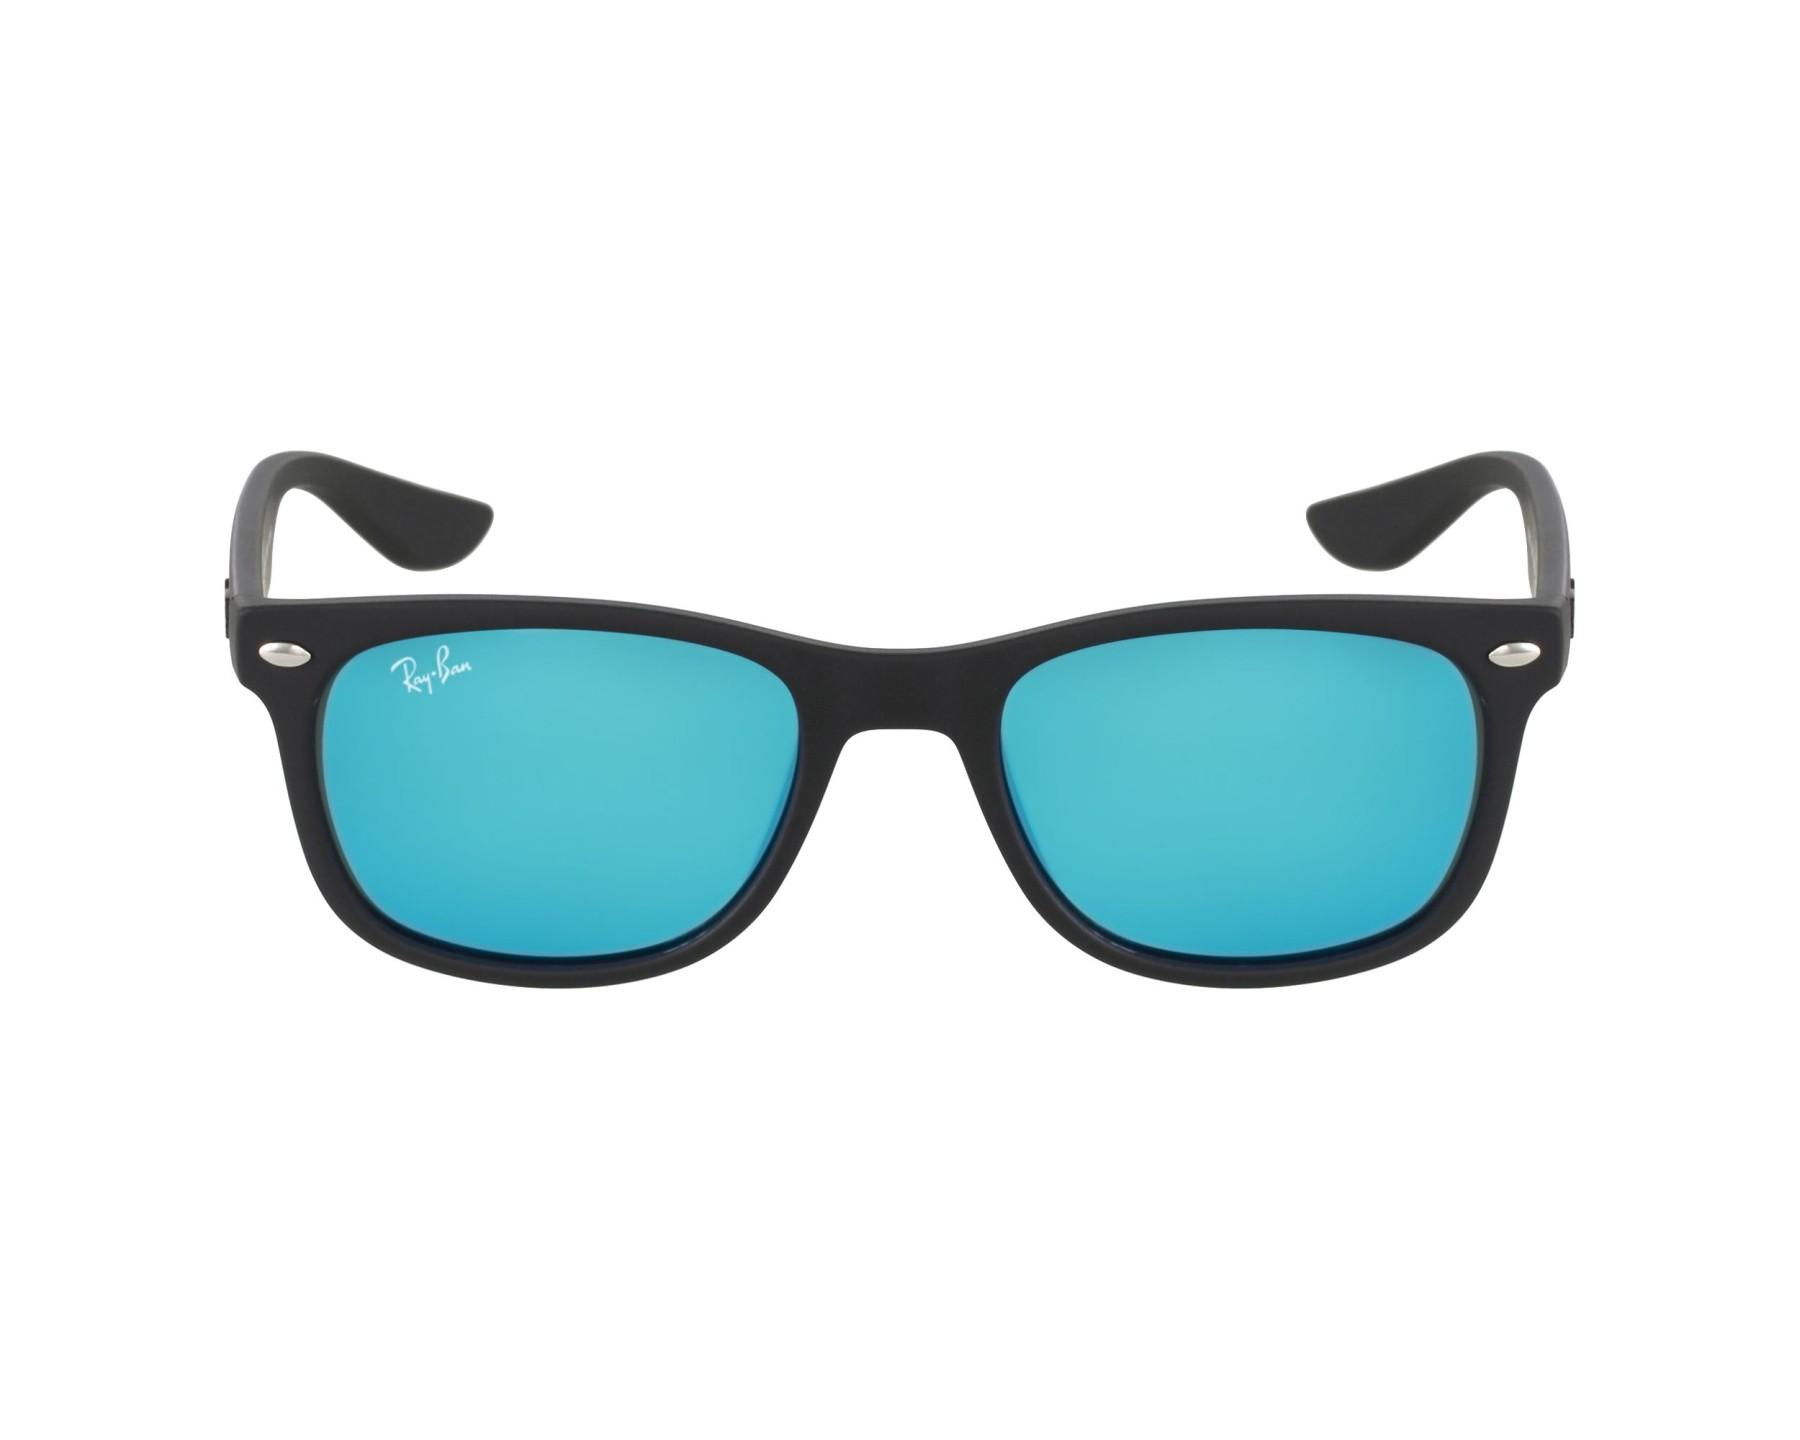 ray ban sonnenbrille junior rj 9052 s 100s55. Black Bedroom Furniture Sets. Home Design Ideas